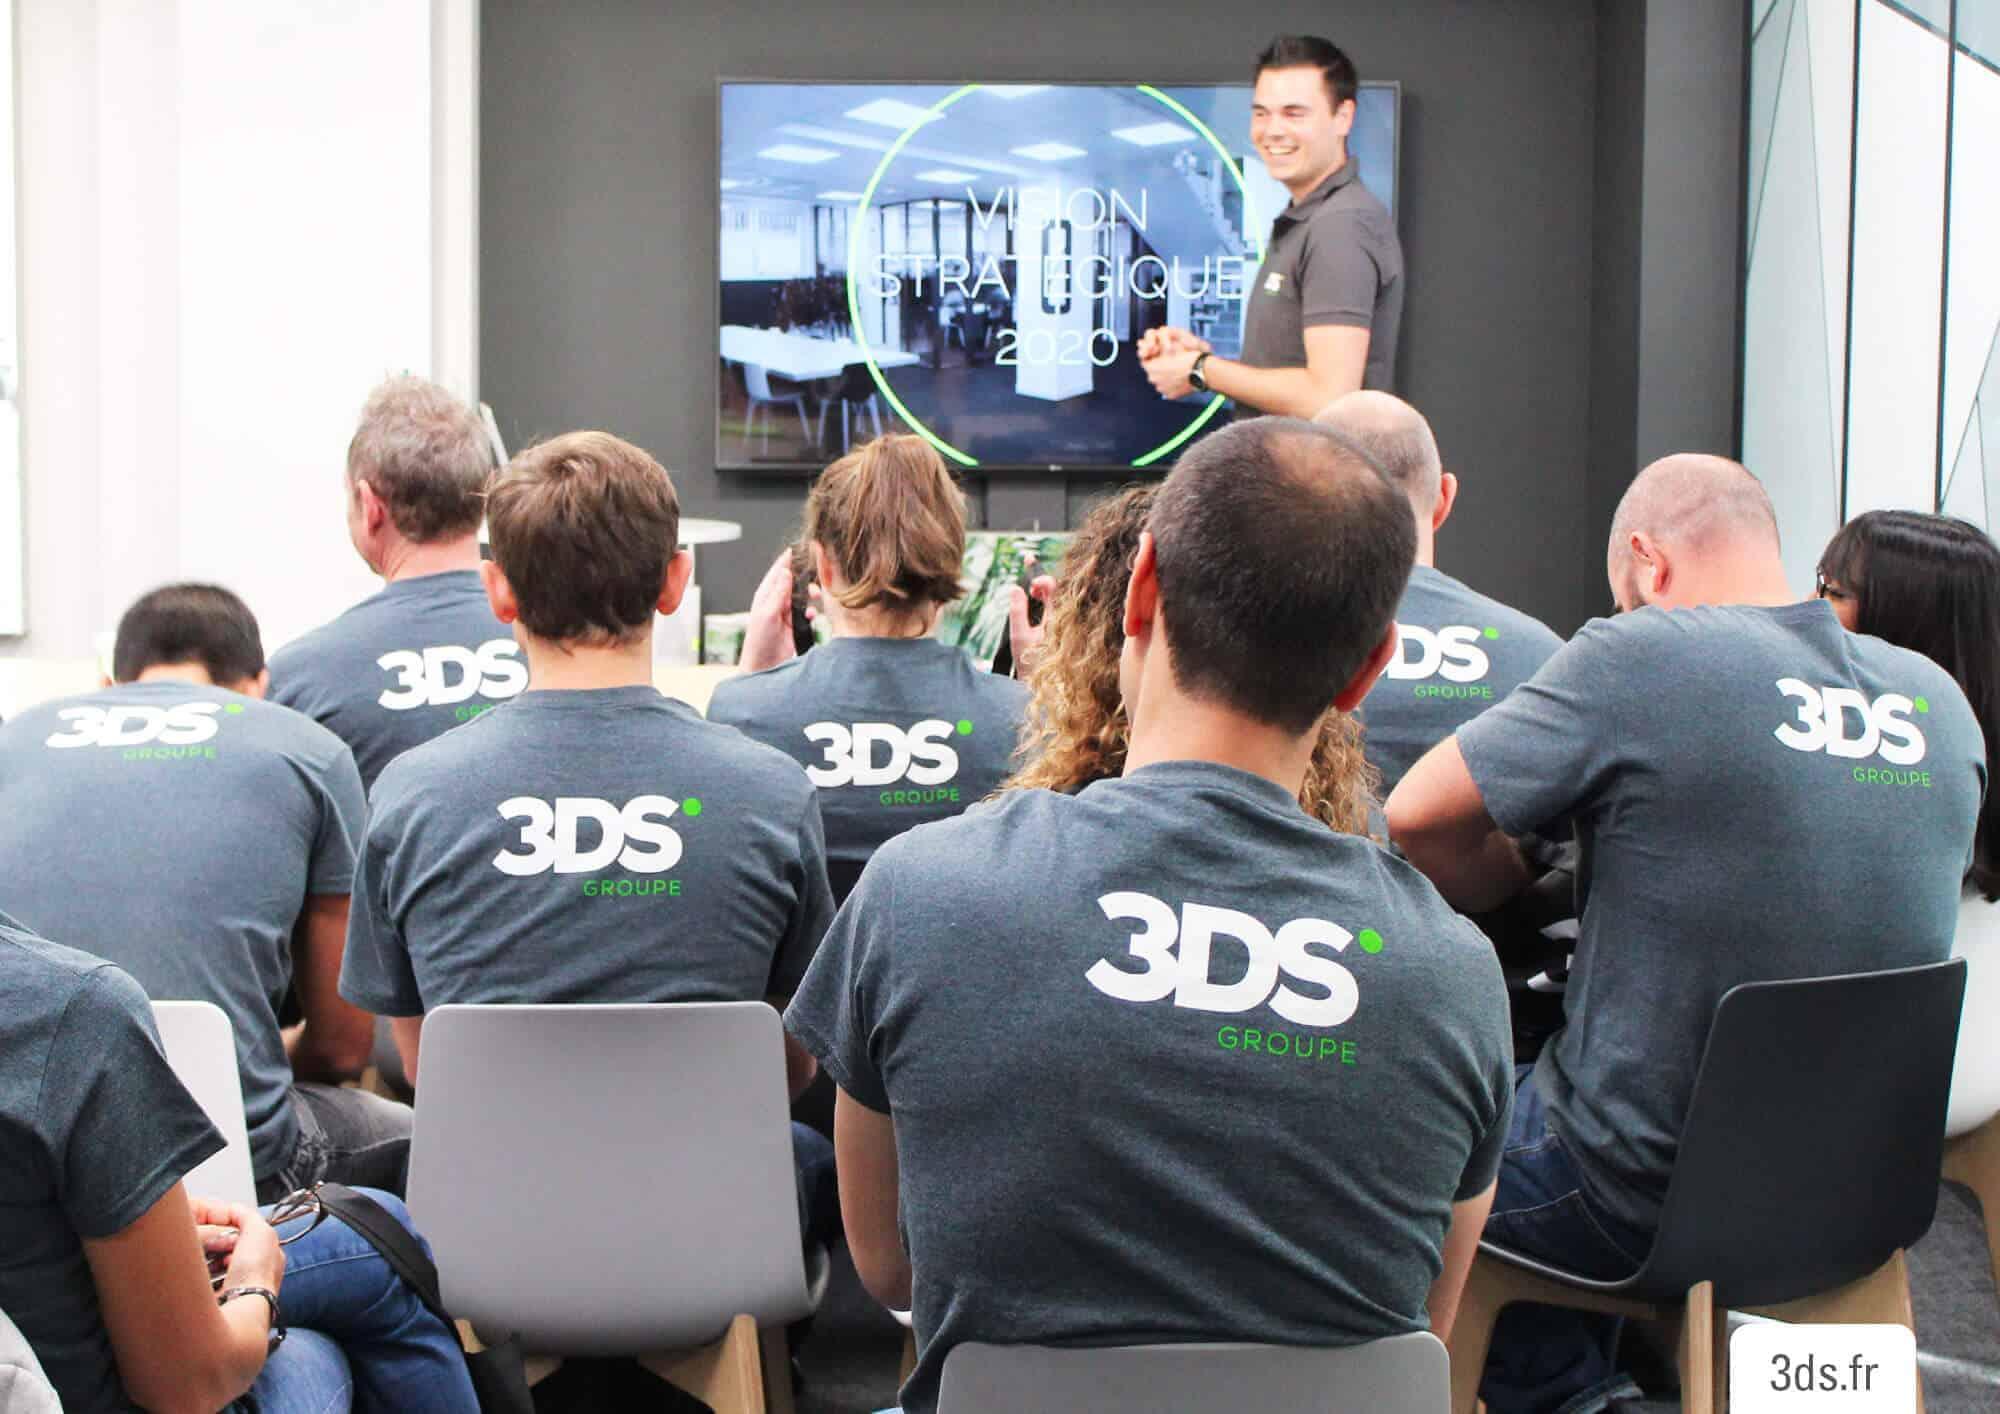 Equipe 3DS Groupe Expert Communication Visuelle